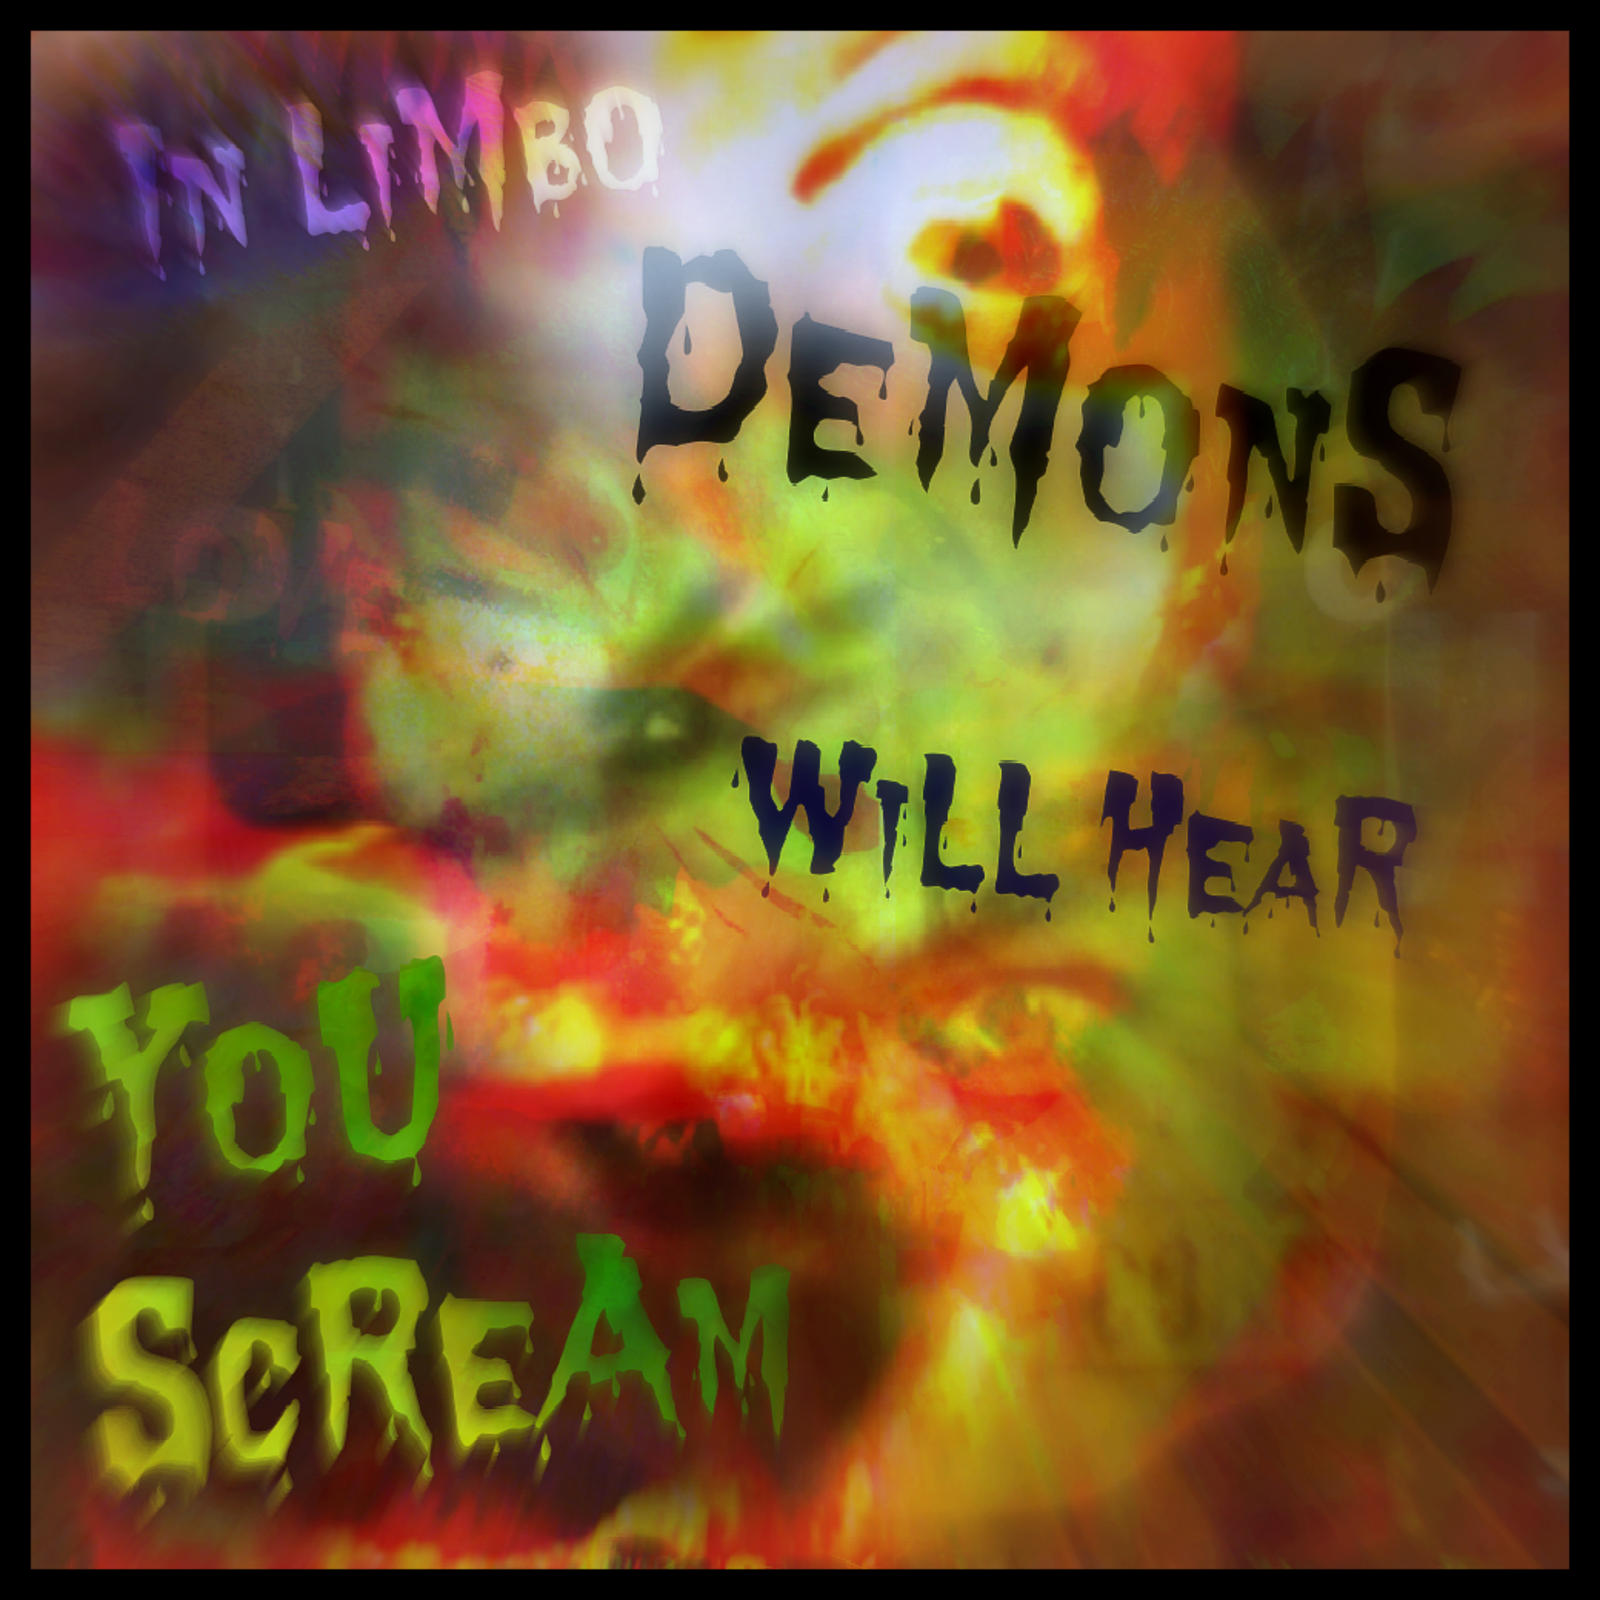 In Limbo Demons will Hear You Scream by MushroomBrain